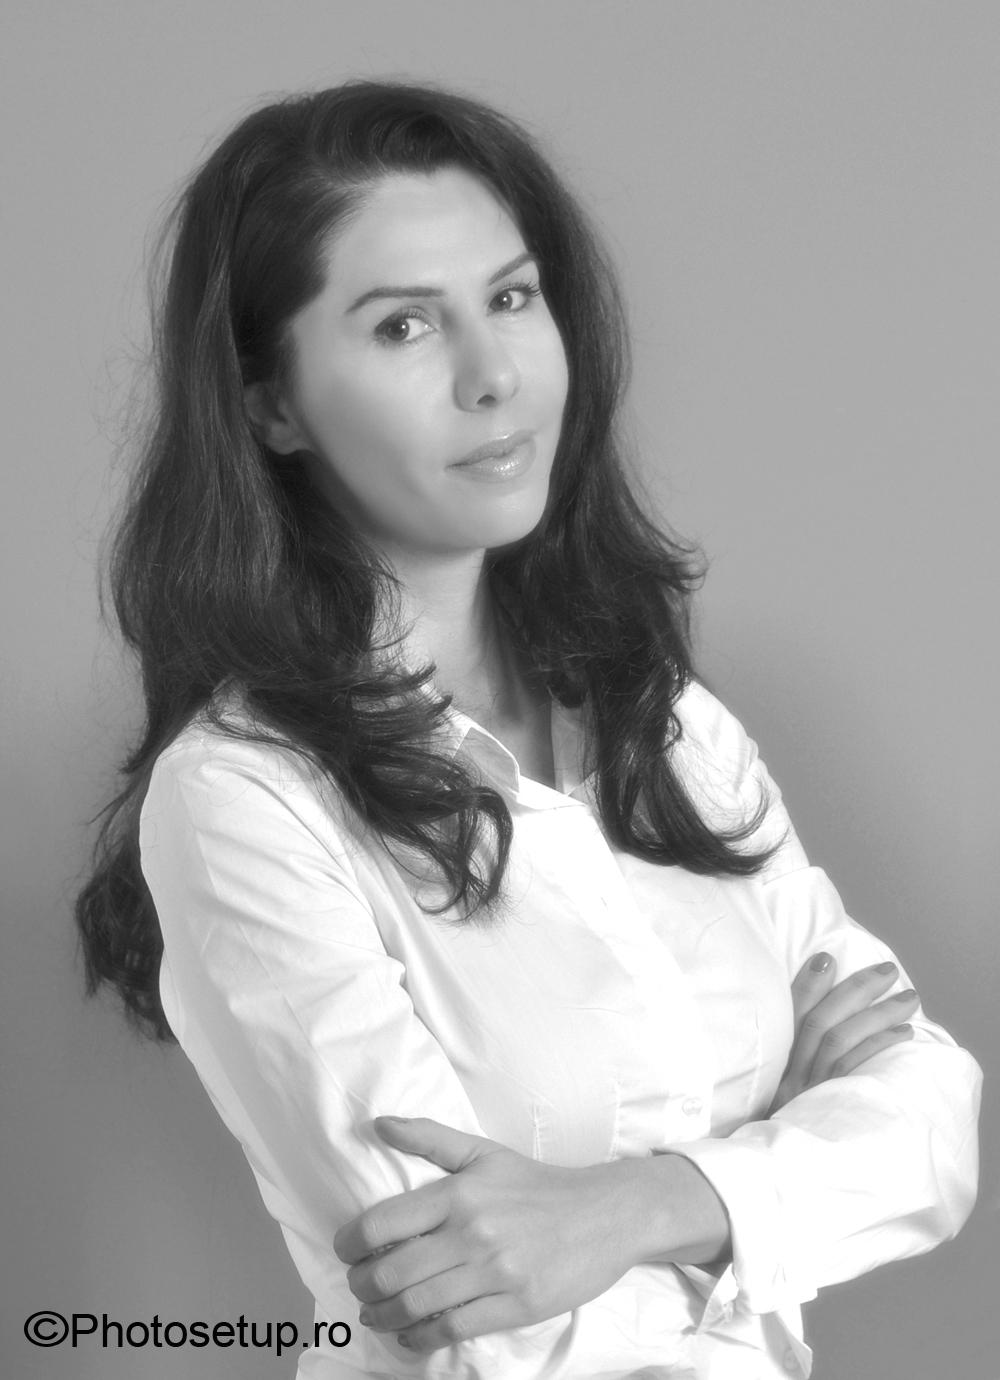 valeria-galea-director-marketing-photosetup